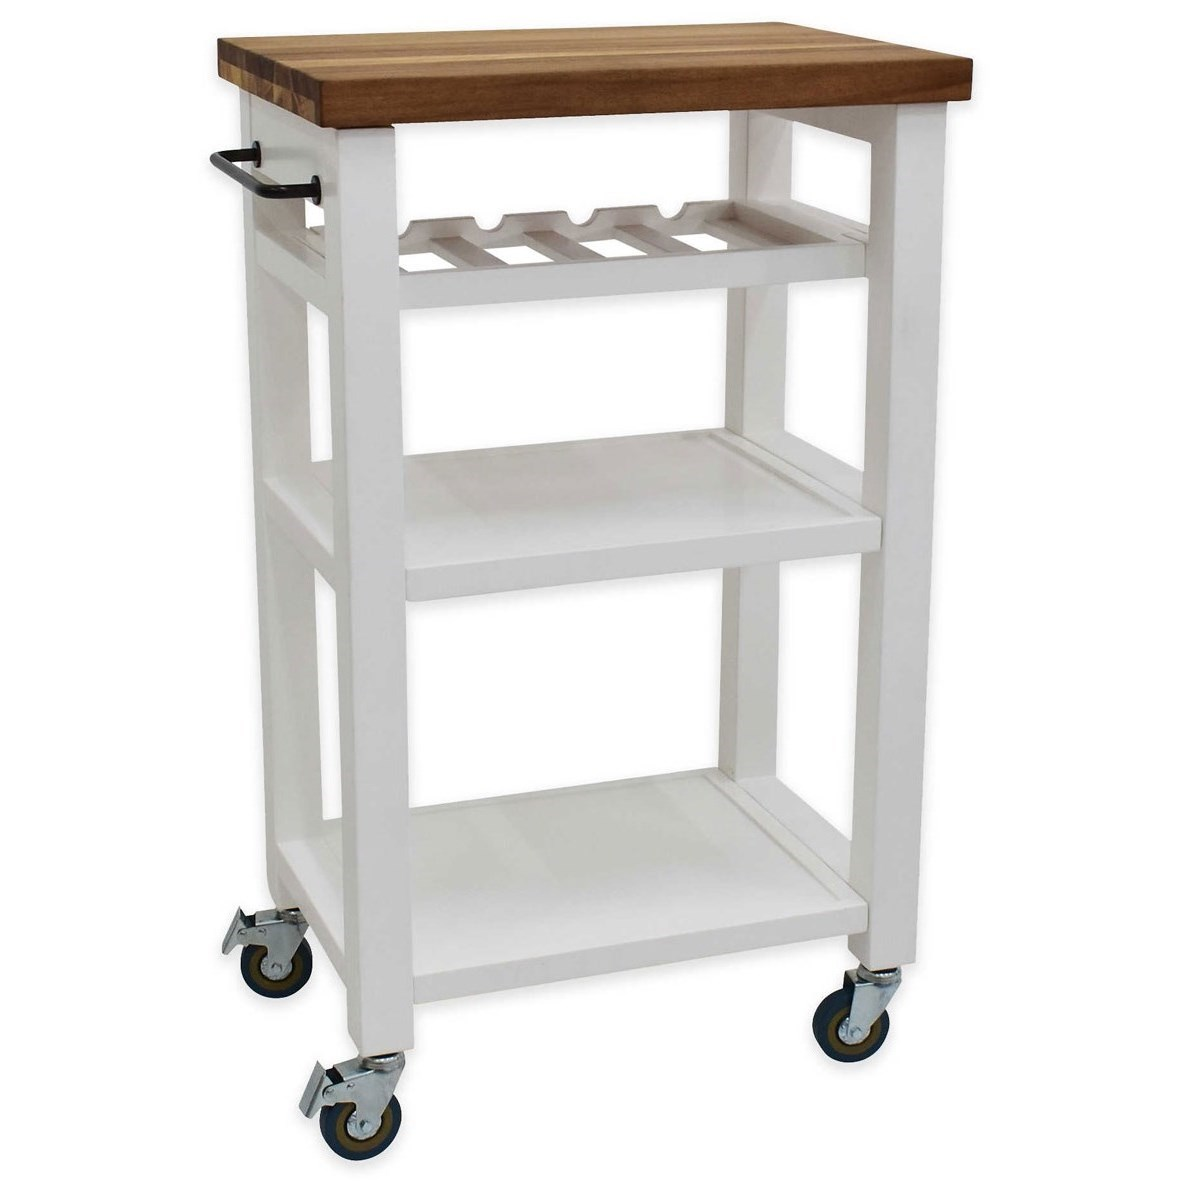 Belden Kitchen Cart by Steve Silver at Walker's Furniture